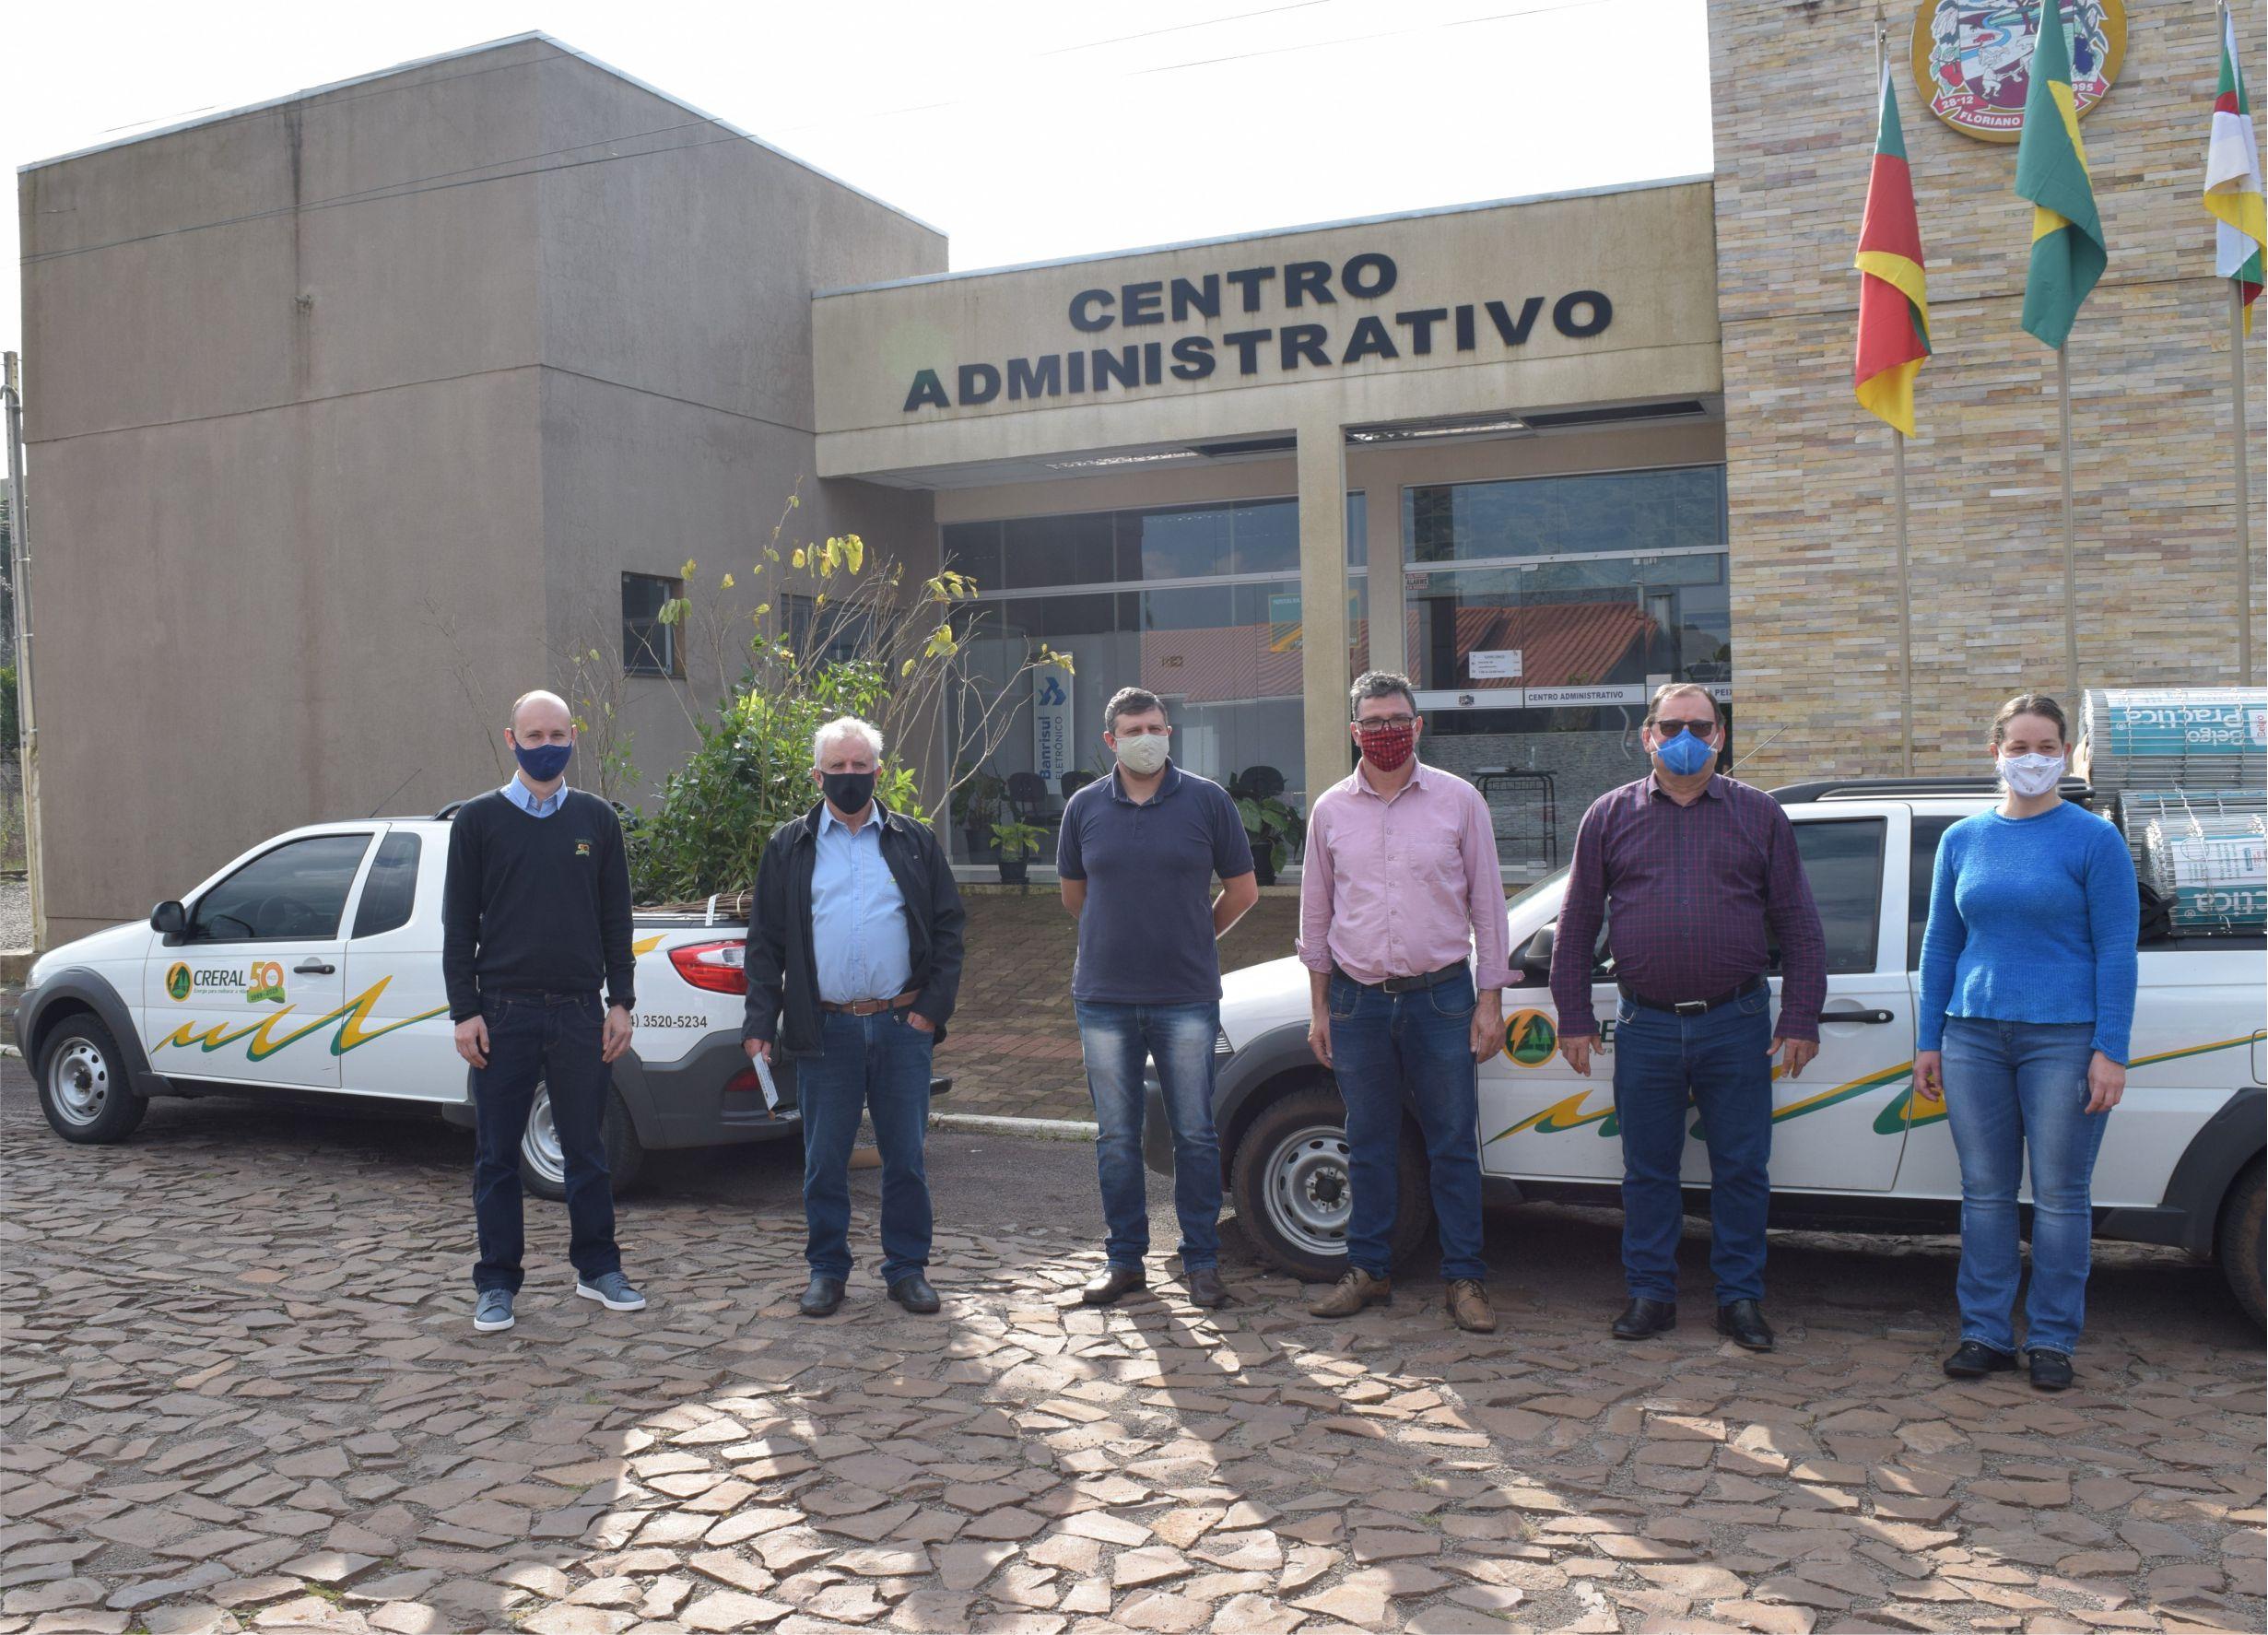 Creral doa 200 mudas de árvores para Floriano Peixoto